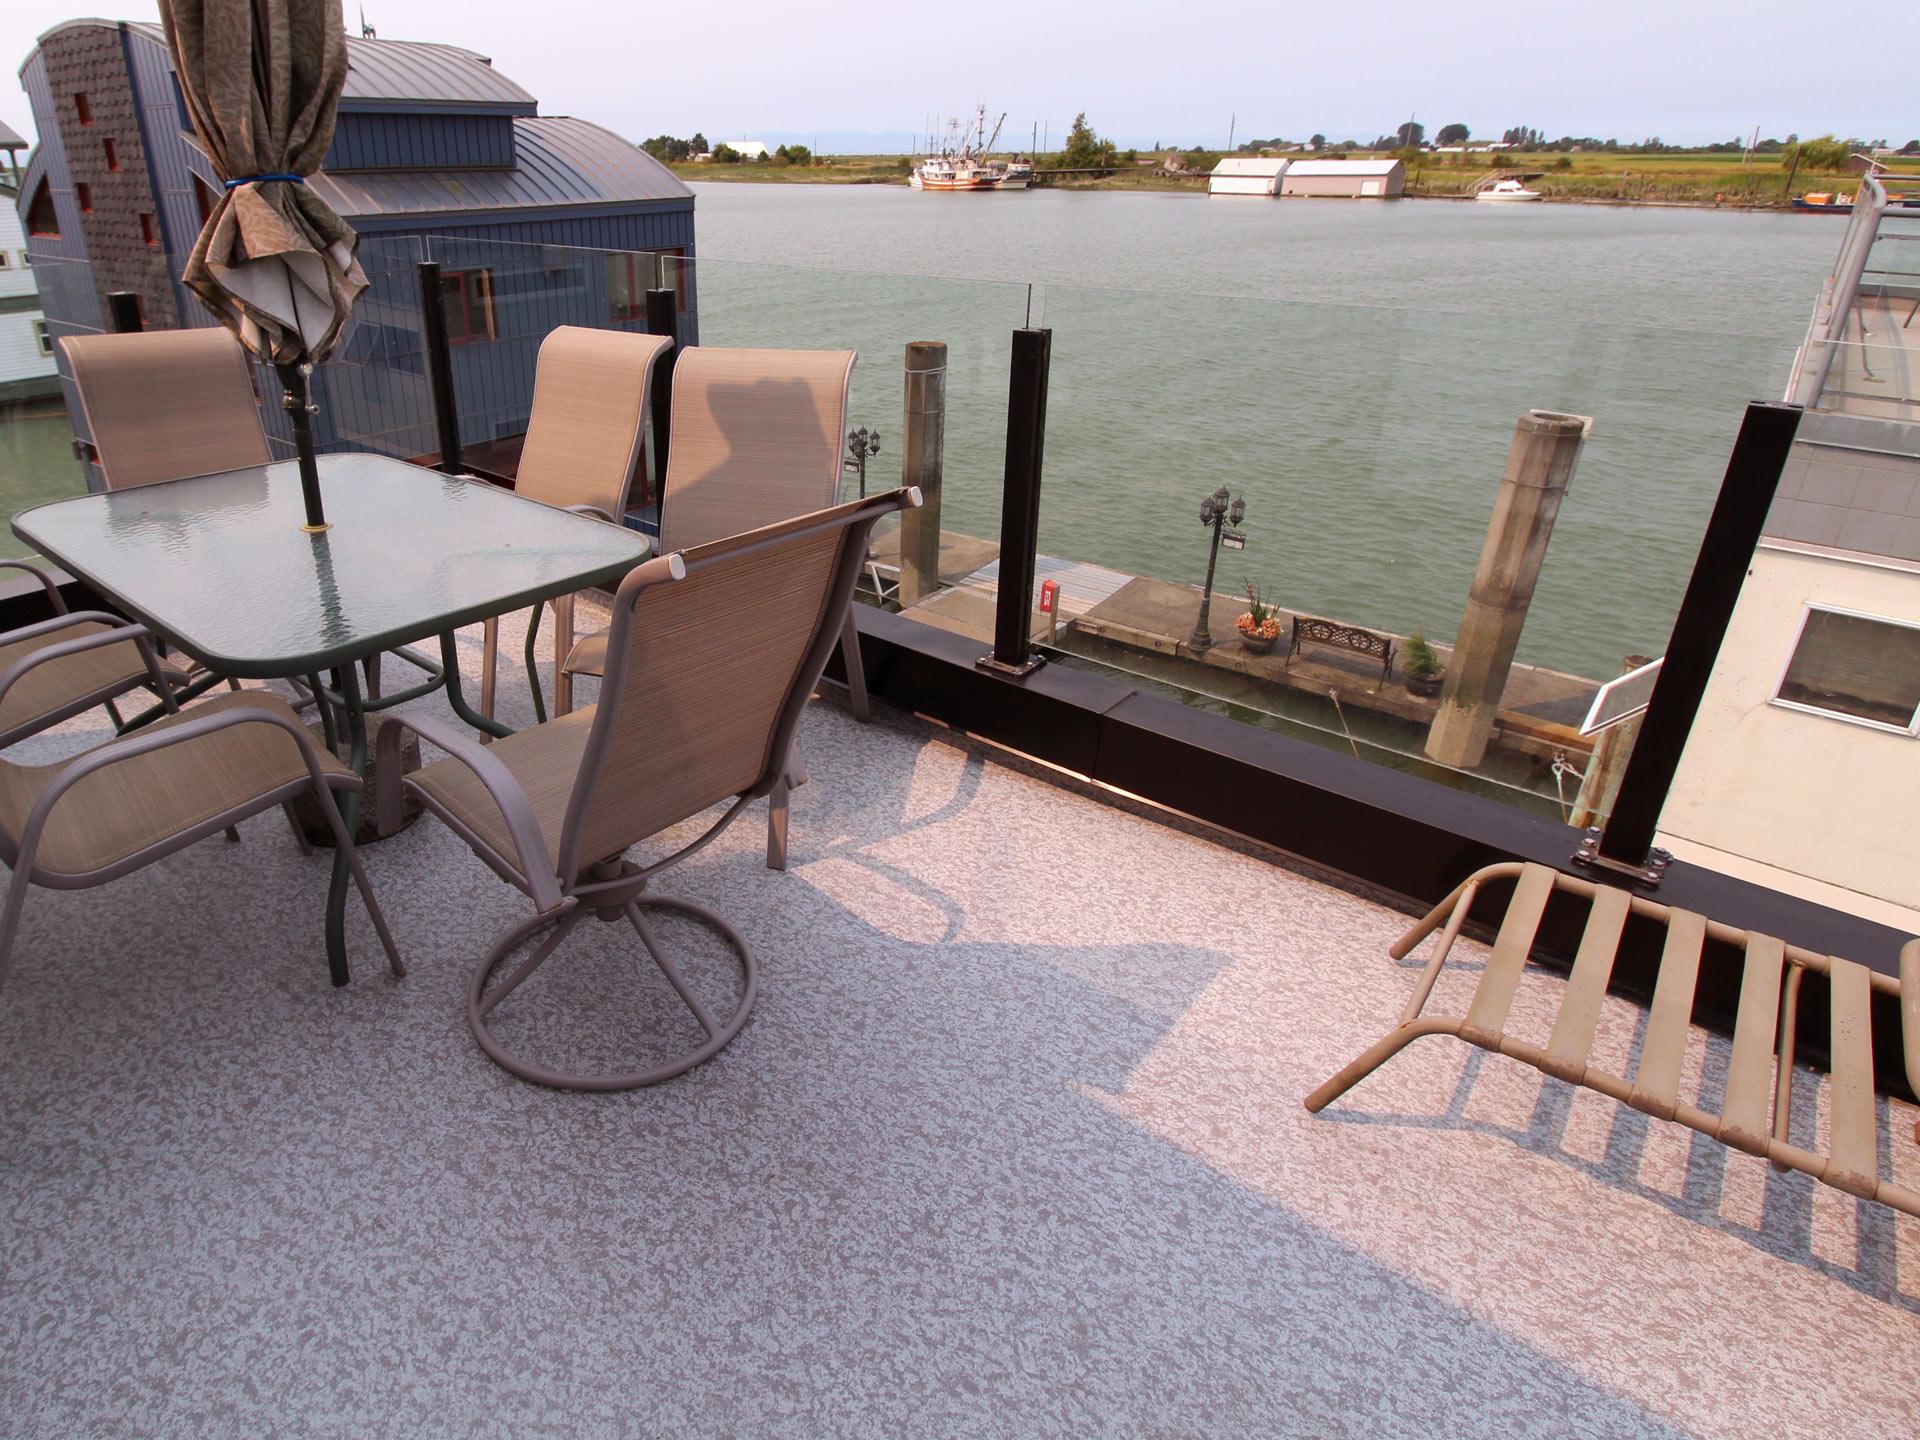 Vinyl Deck Color and Pattern Options for Waterproof Decks